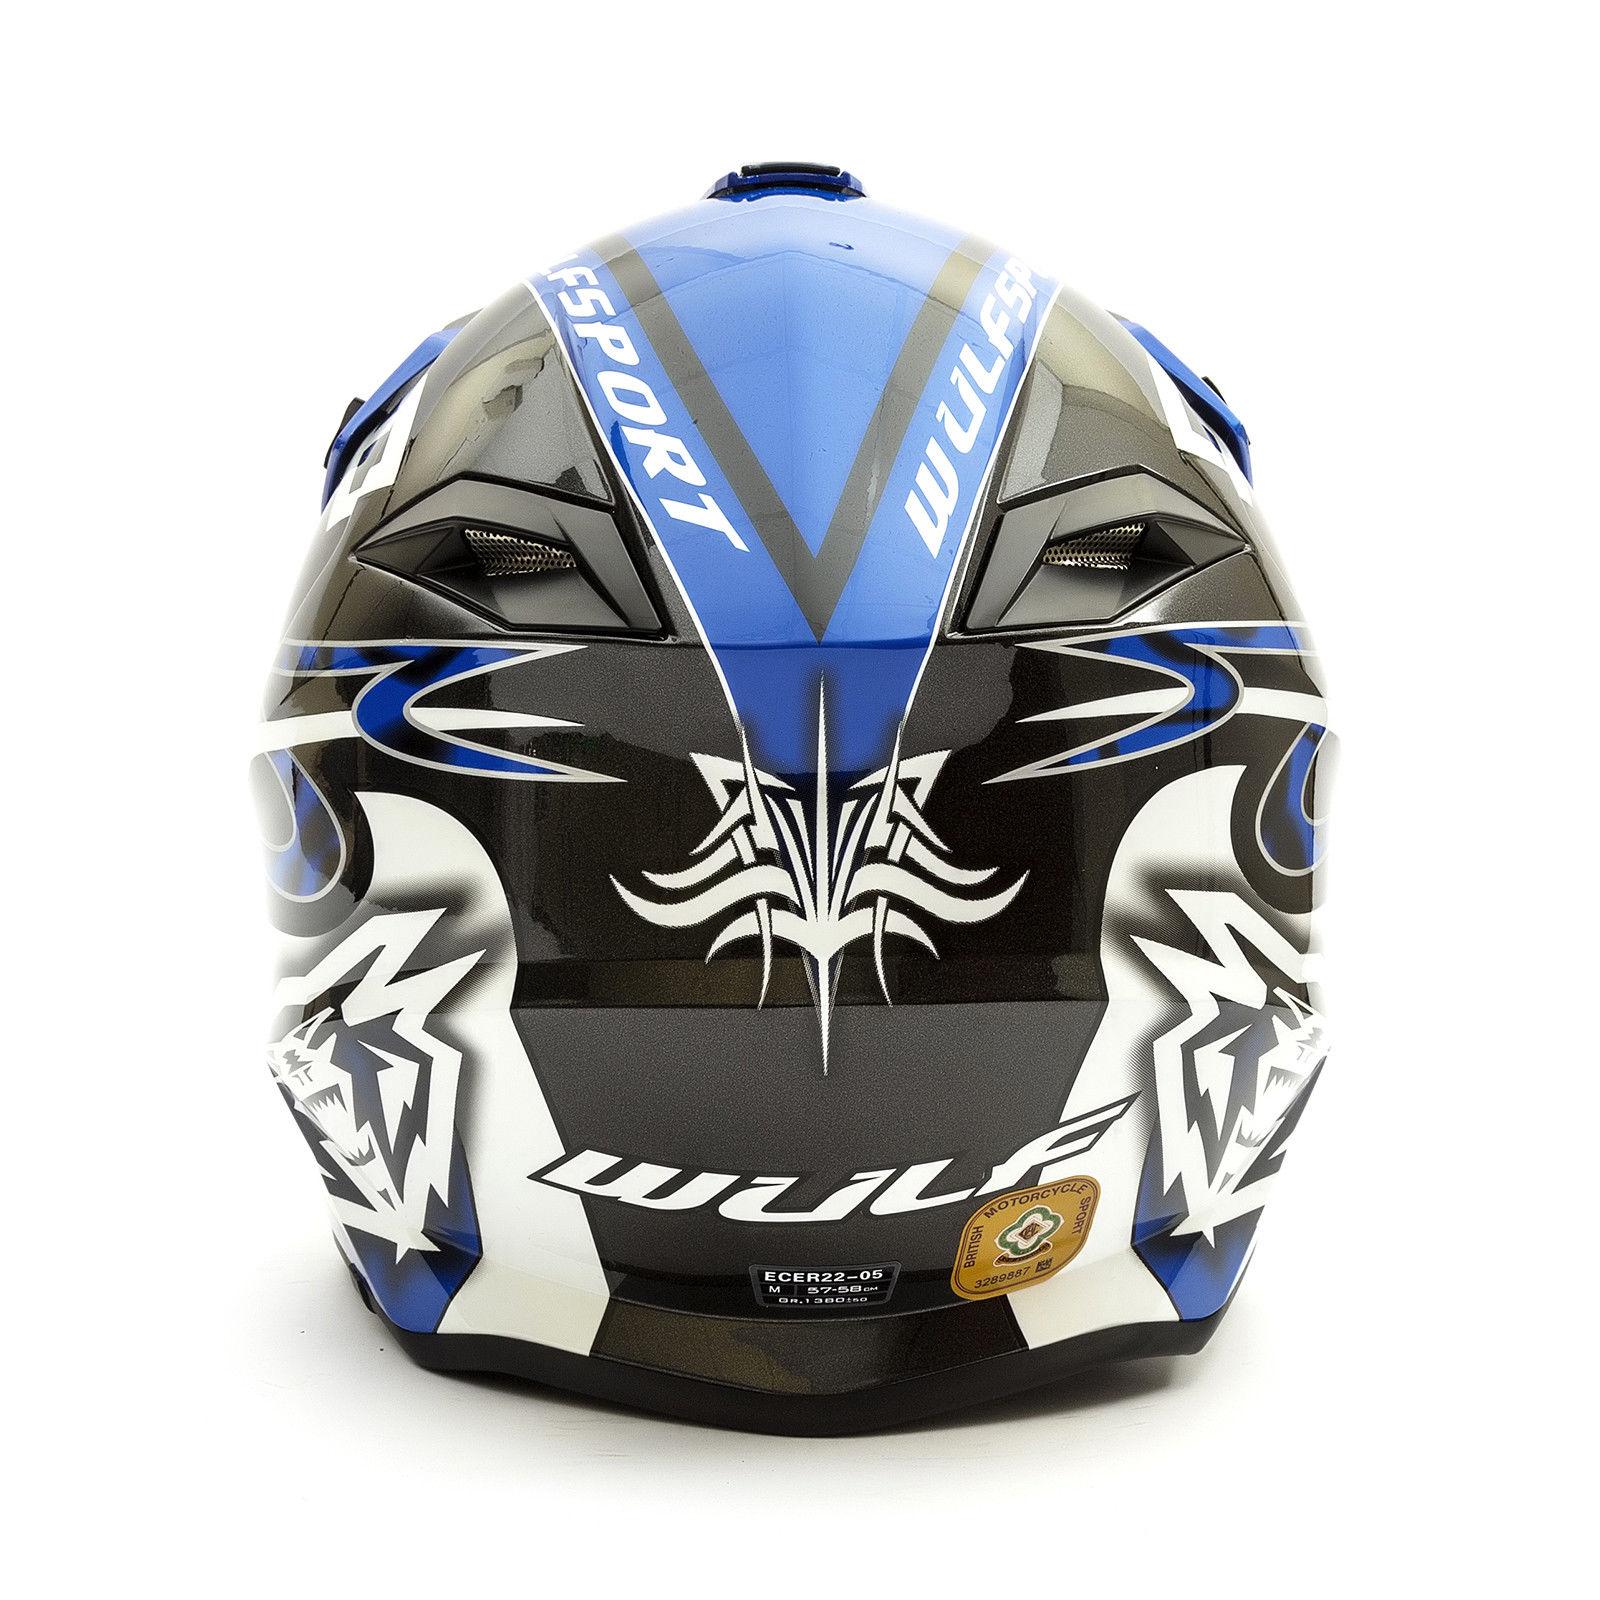 Wulfsport-Adult-Sceptre-Helmets-Motocross-Pitbike-Motorbike-Off-Road-Racing-ATV thumbnail 24